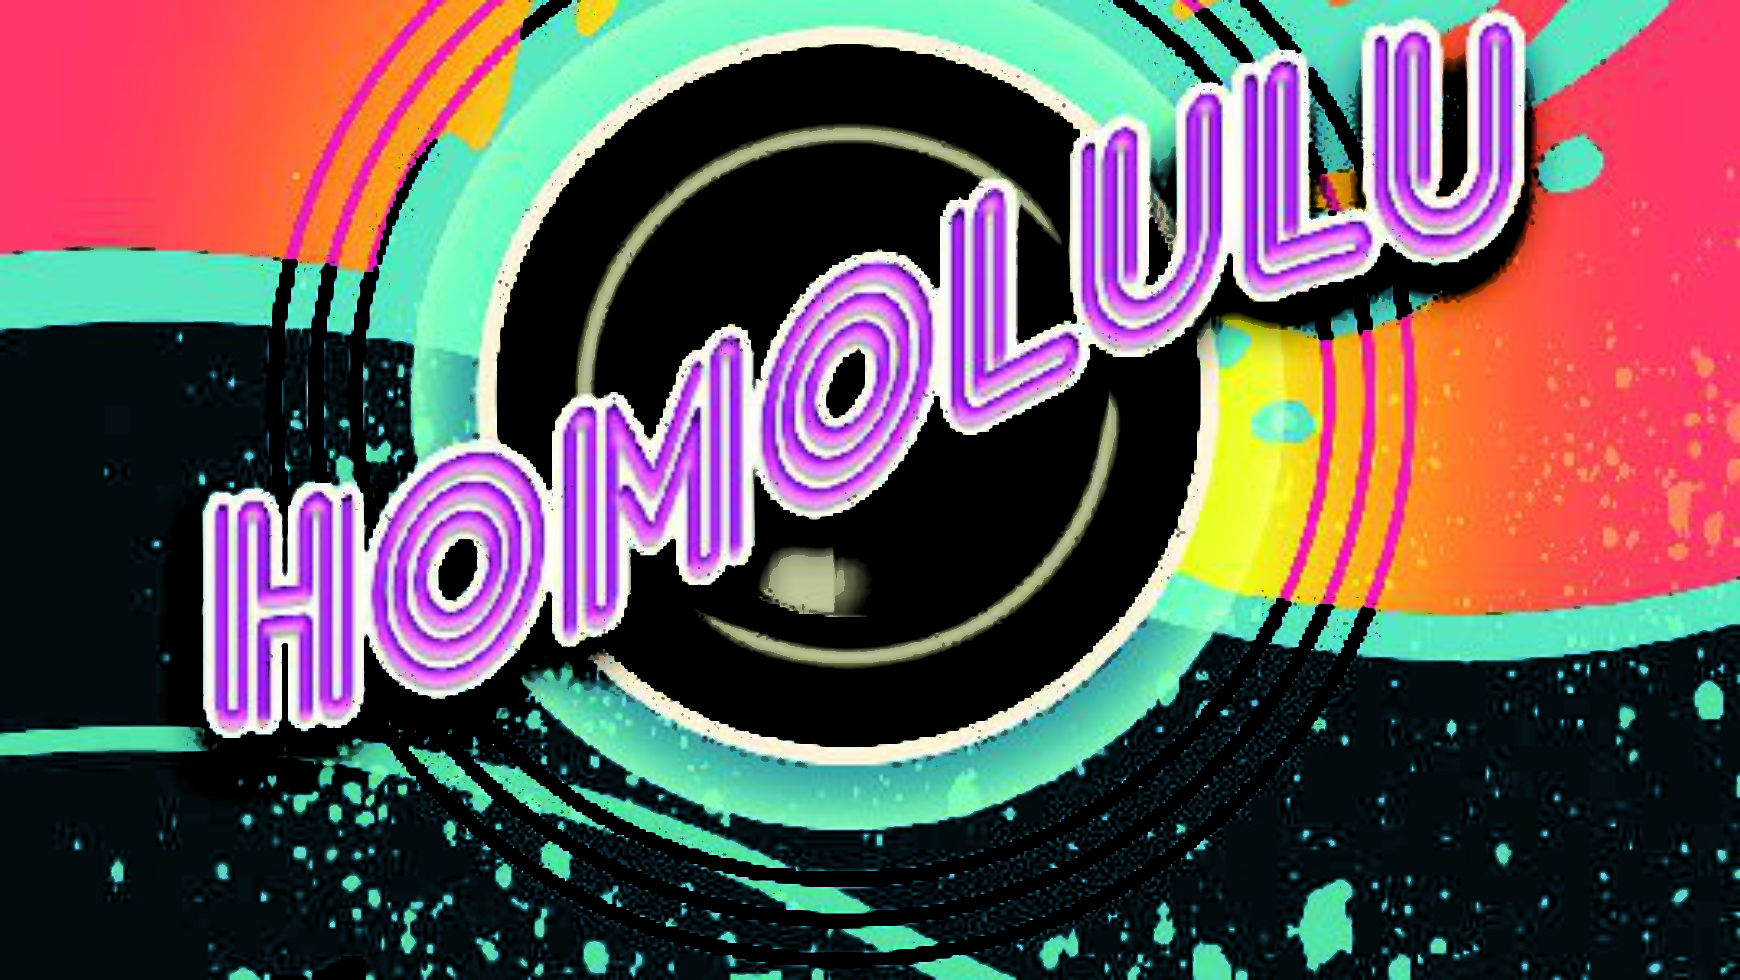 HOMOLULU – PARADISE CSD POOL PARTY @ PARADISE SPA CLUB DESDEN